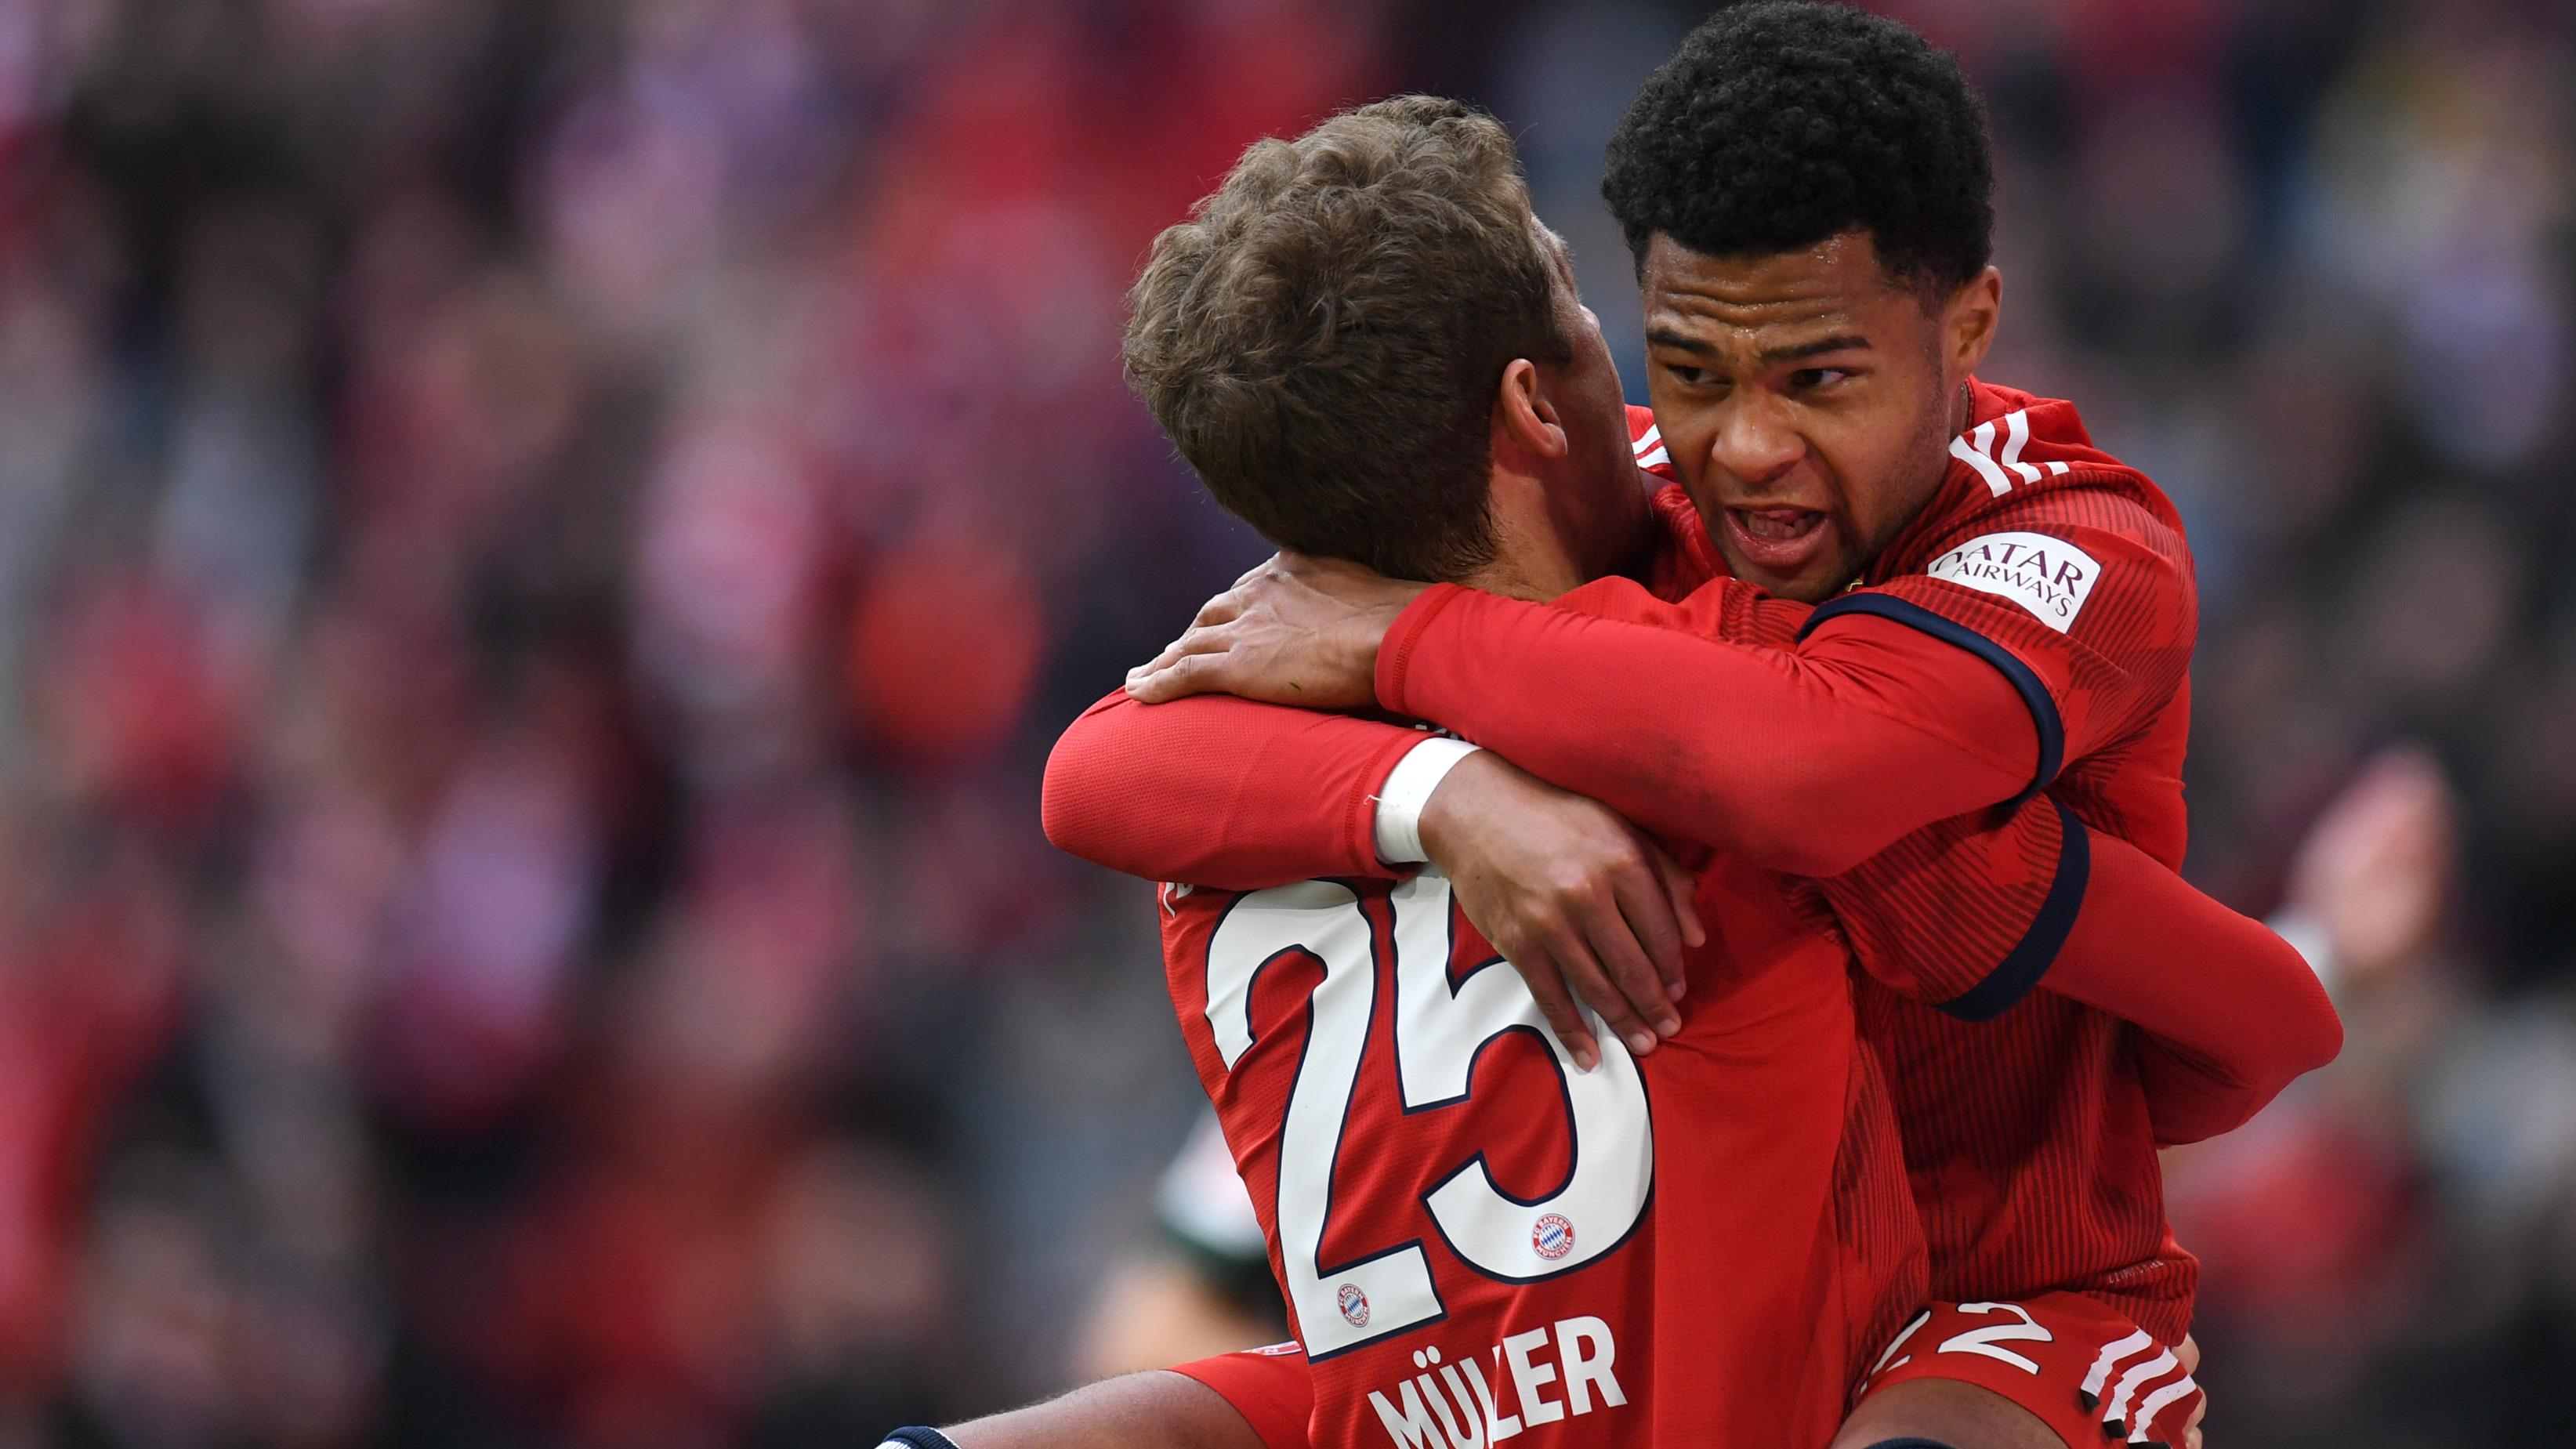 Bayern Munich - Serge Gnabry vole au secours de Thomas Müller